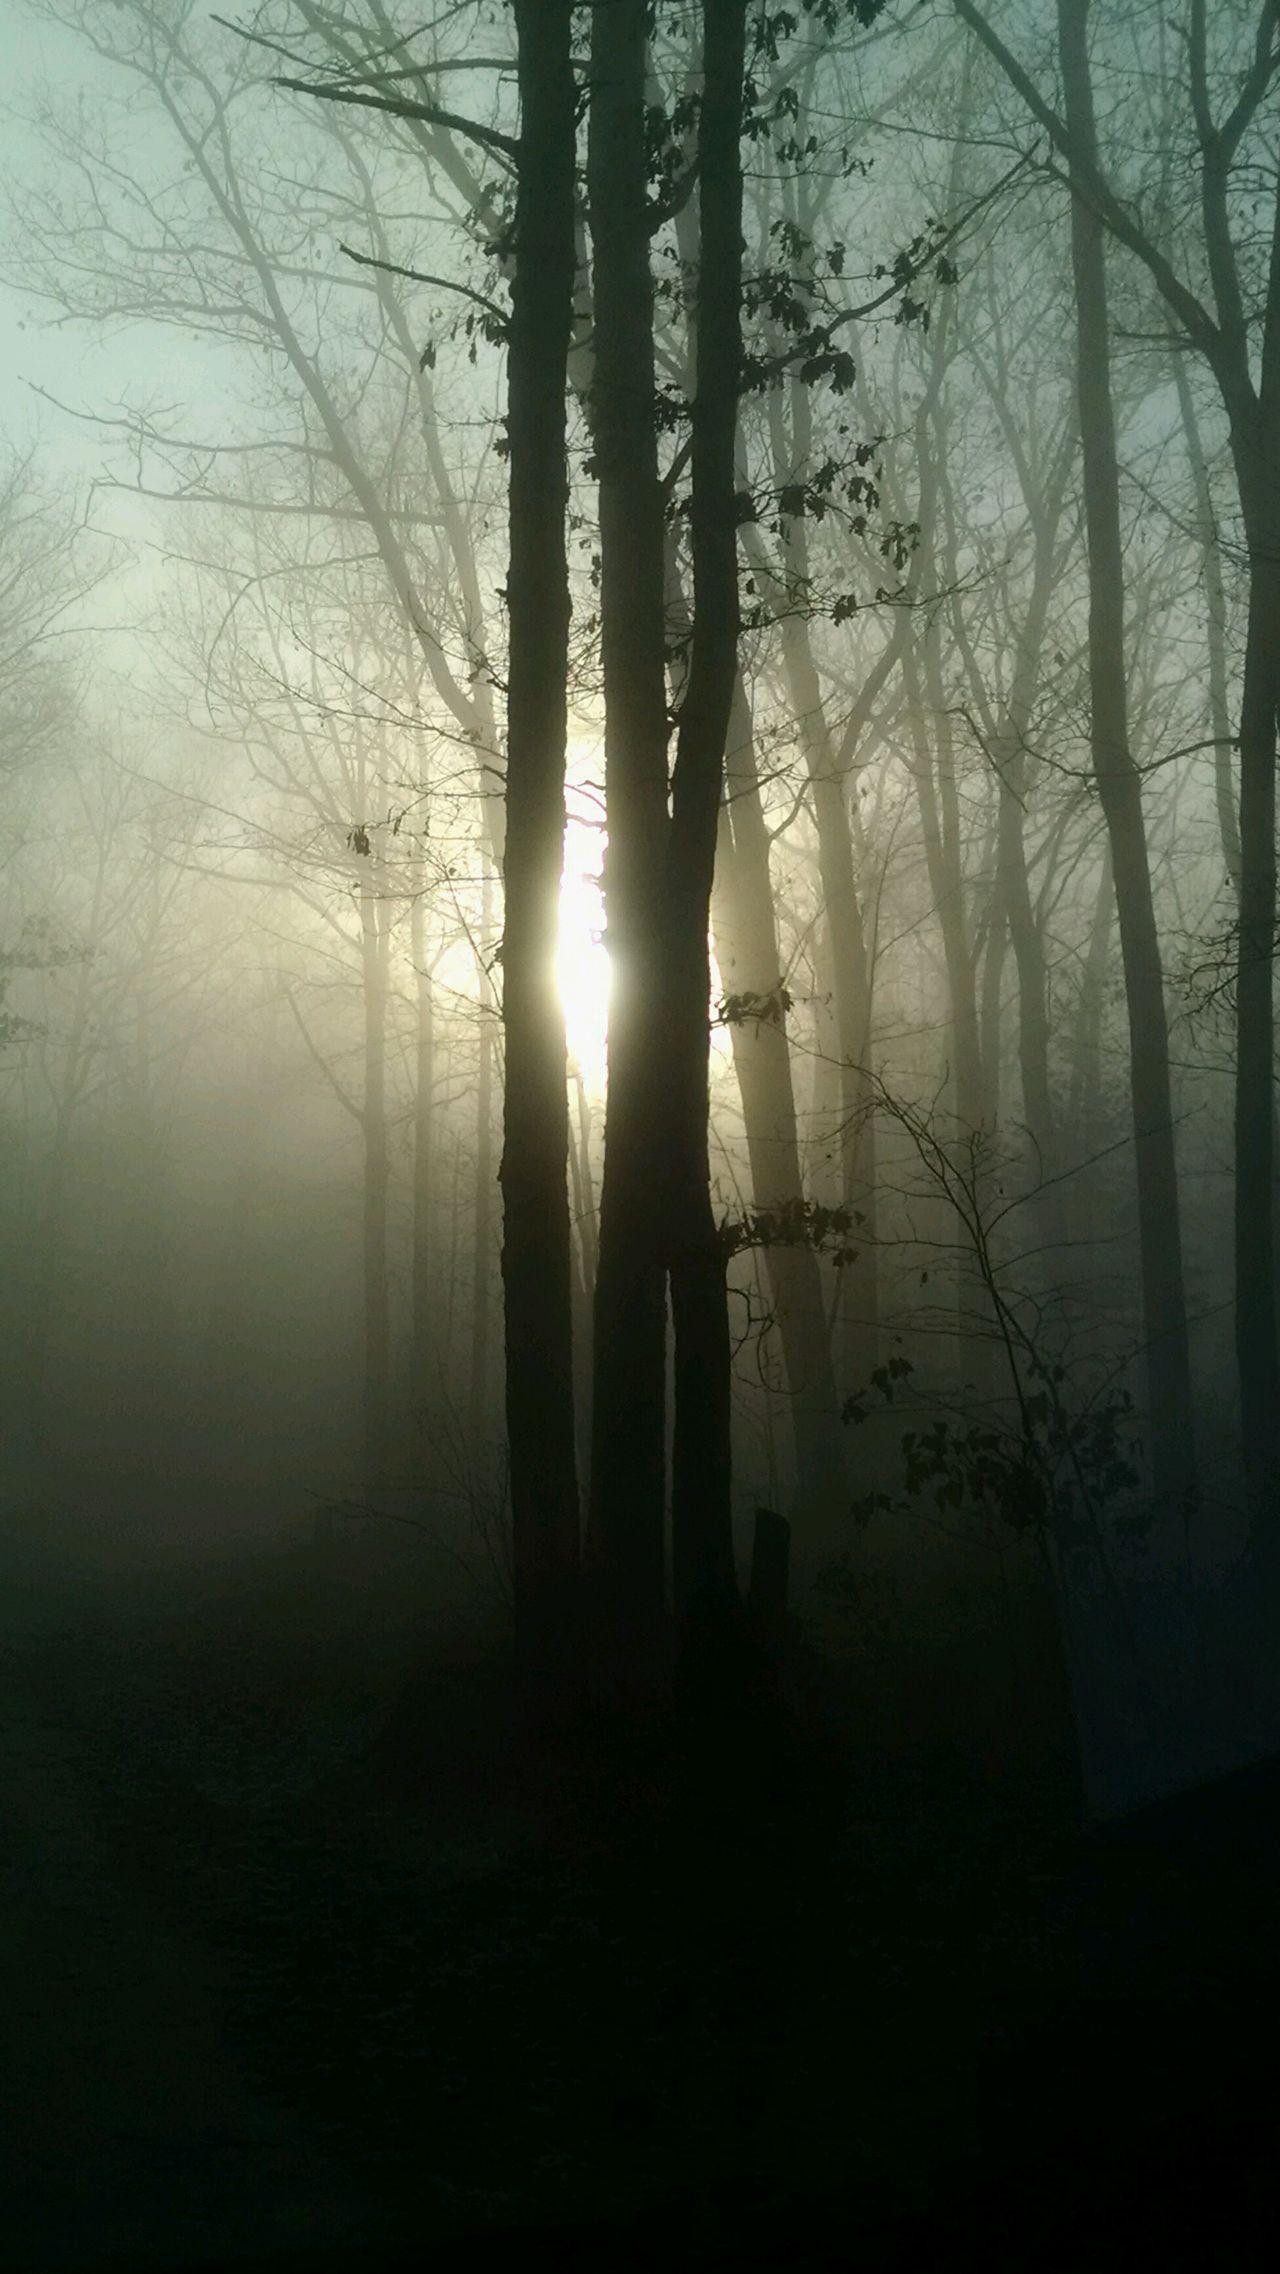 Morning Fog EyeEm Best Shots Eyeem Marketplace Eyeem Trending Eyeem Nature Natural Landscape Nature Trees Popular The 2016 EyeEm Awards